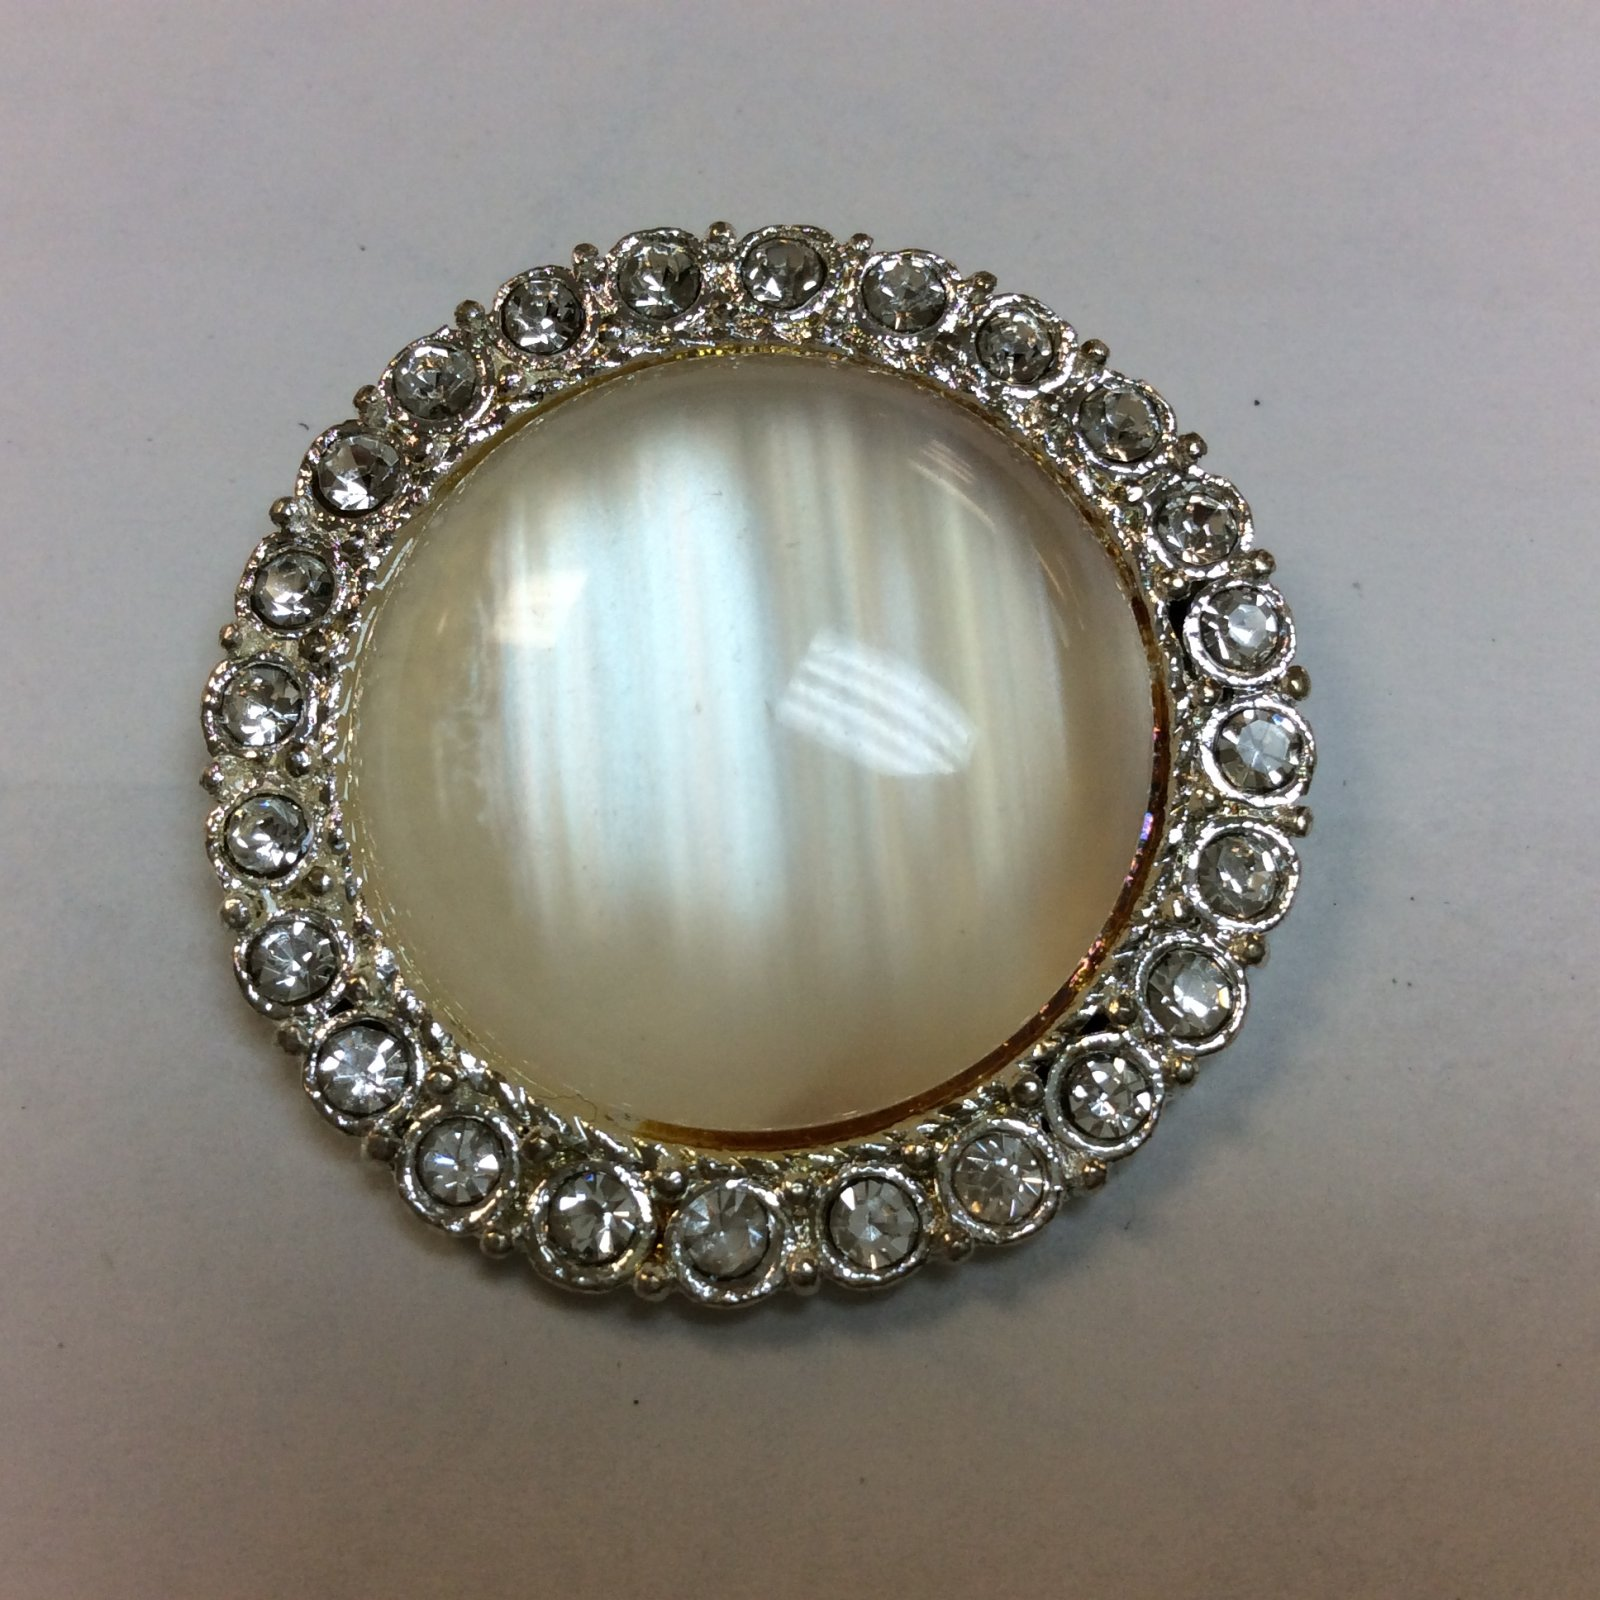 Moonstone Rhinestone Button 1 3/8 Inch 32901